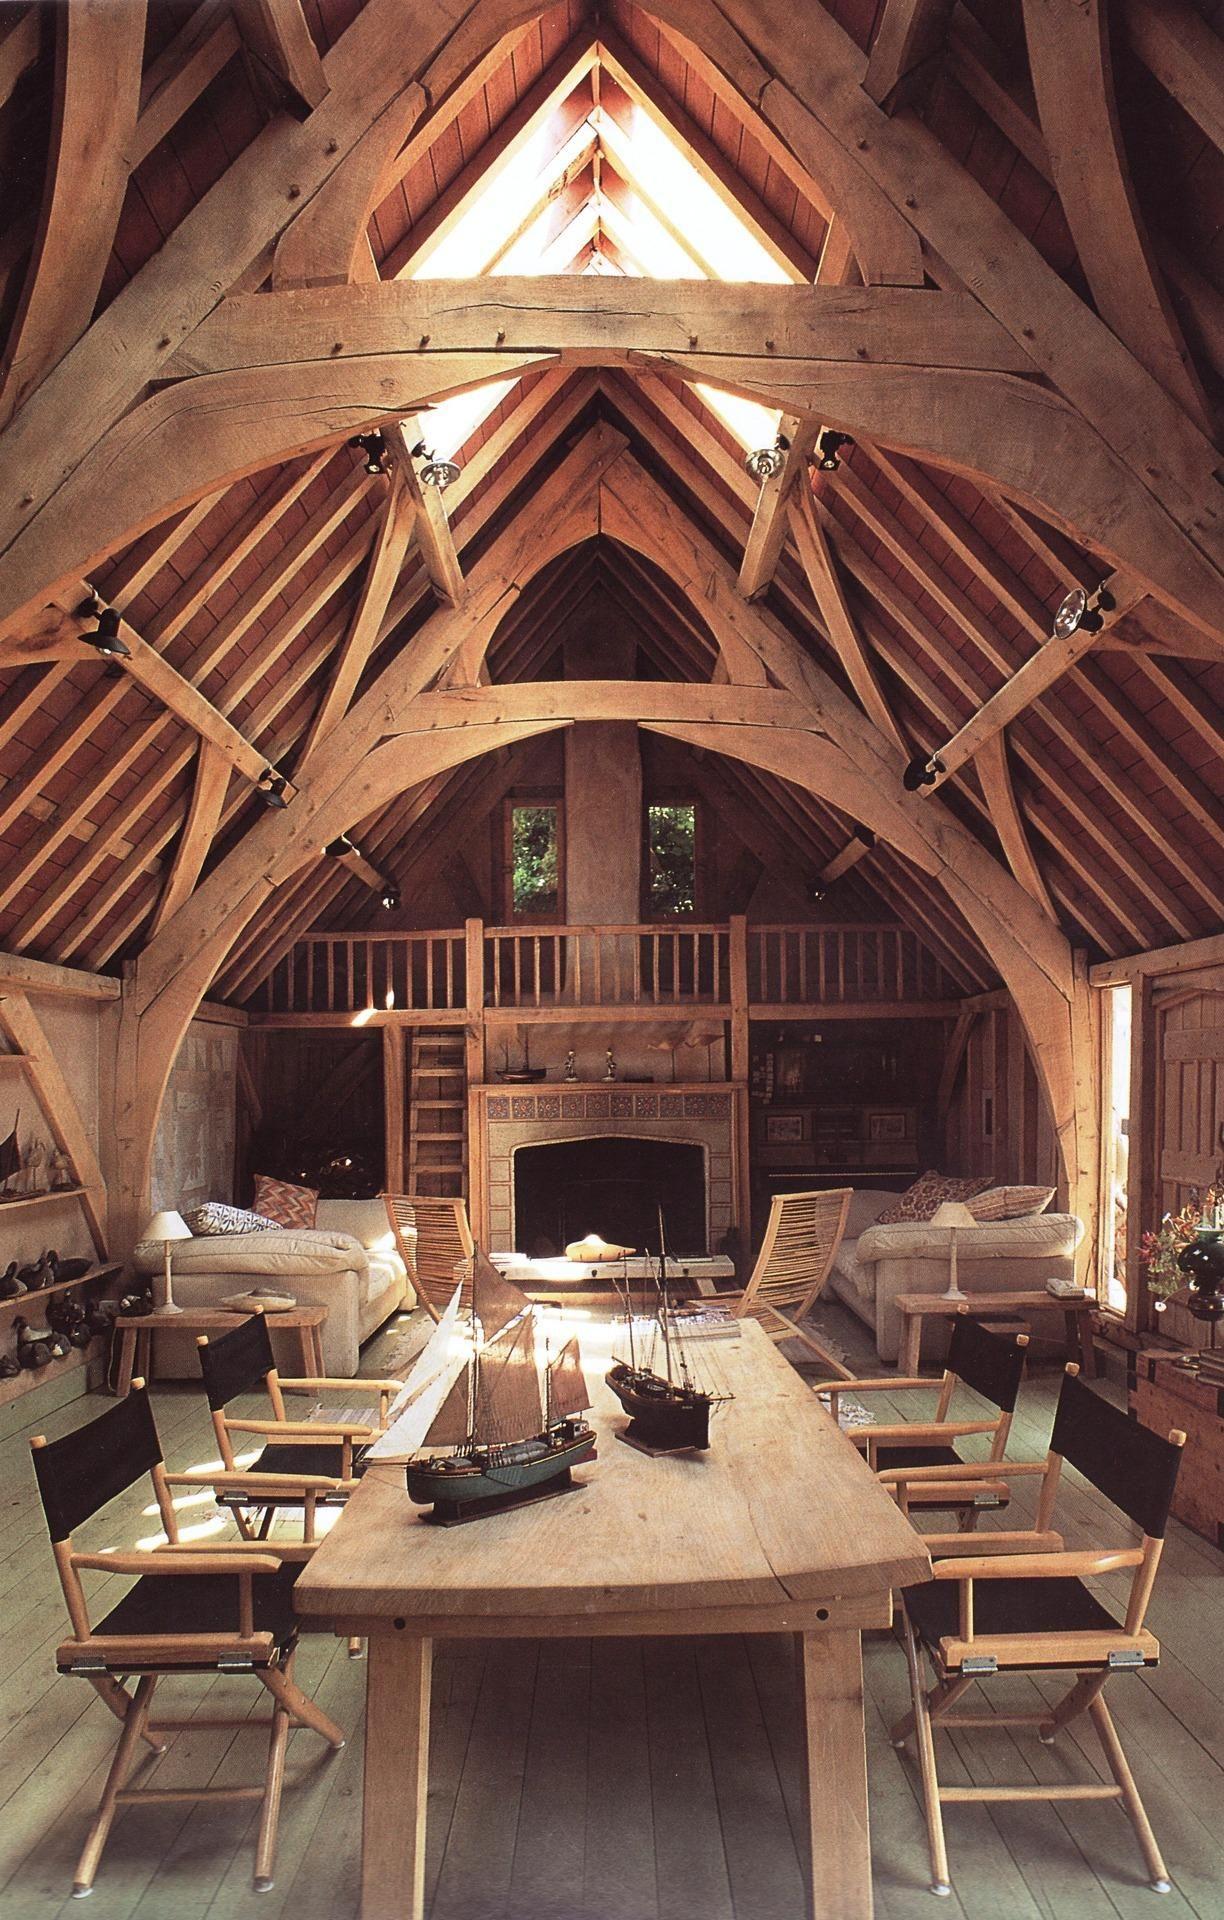 A Frame Cabin Contemporary House Plan 90603: Into The Wild